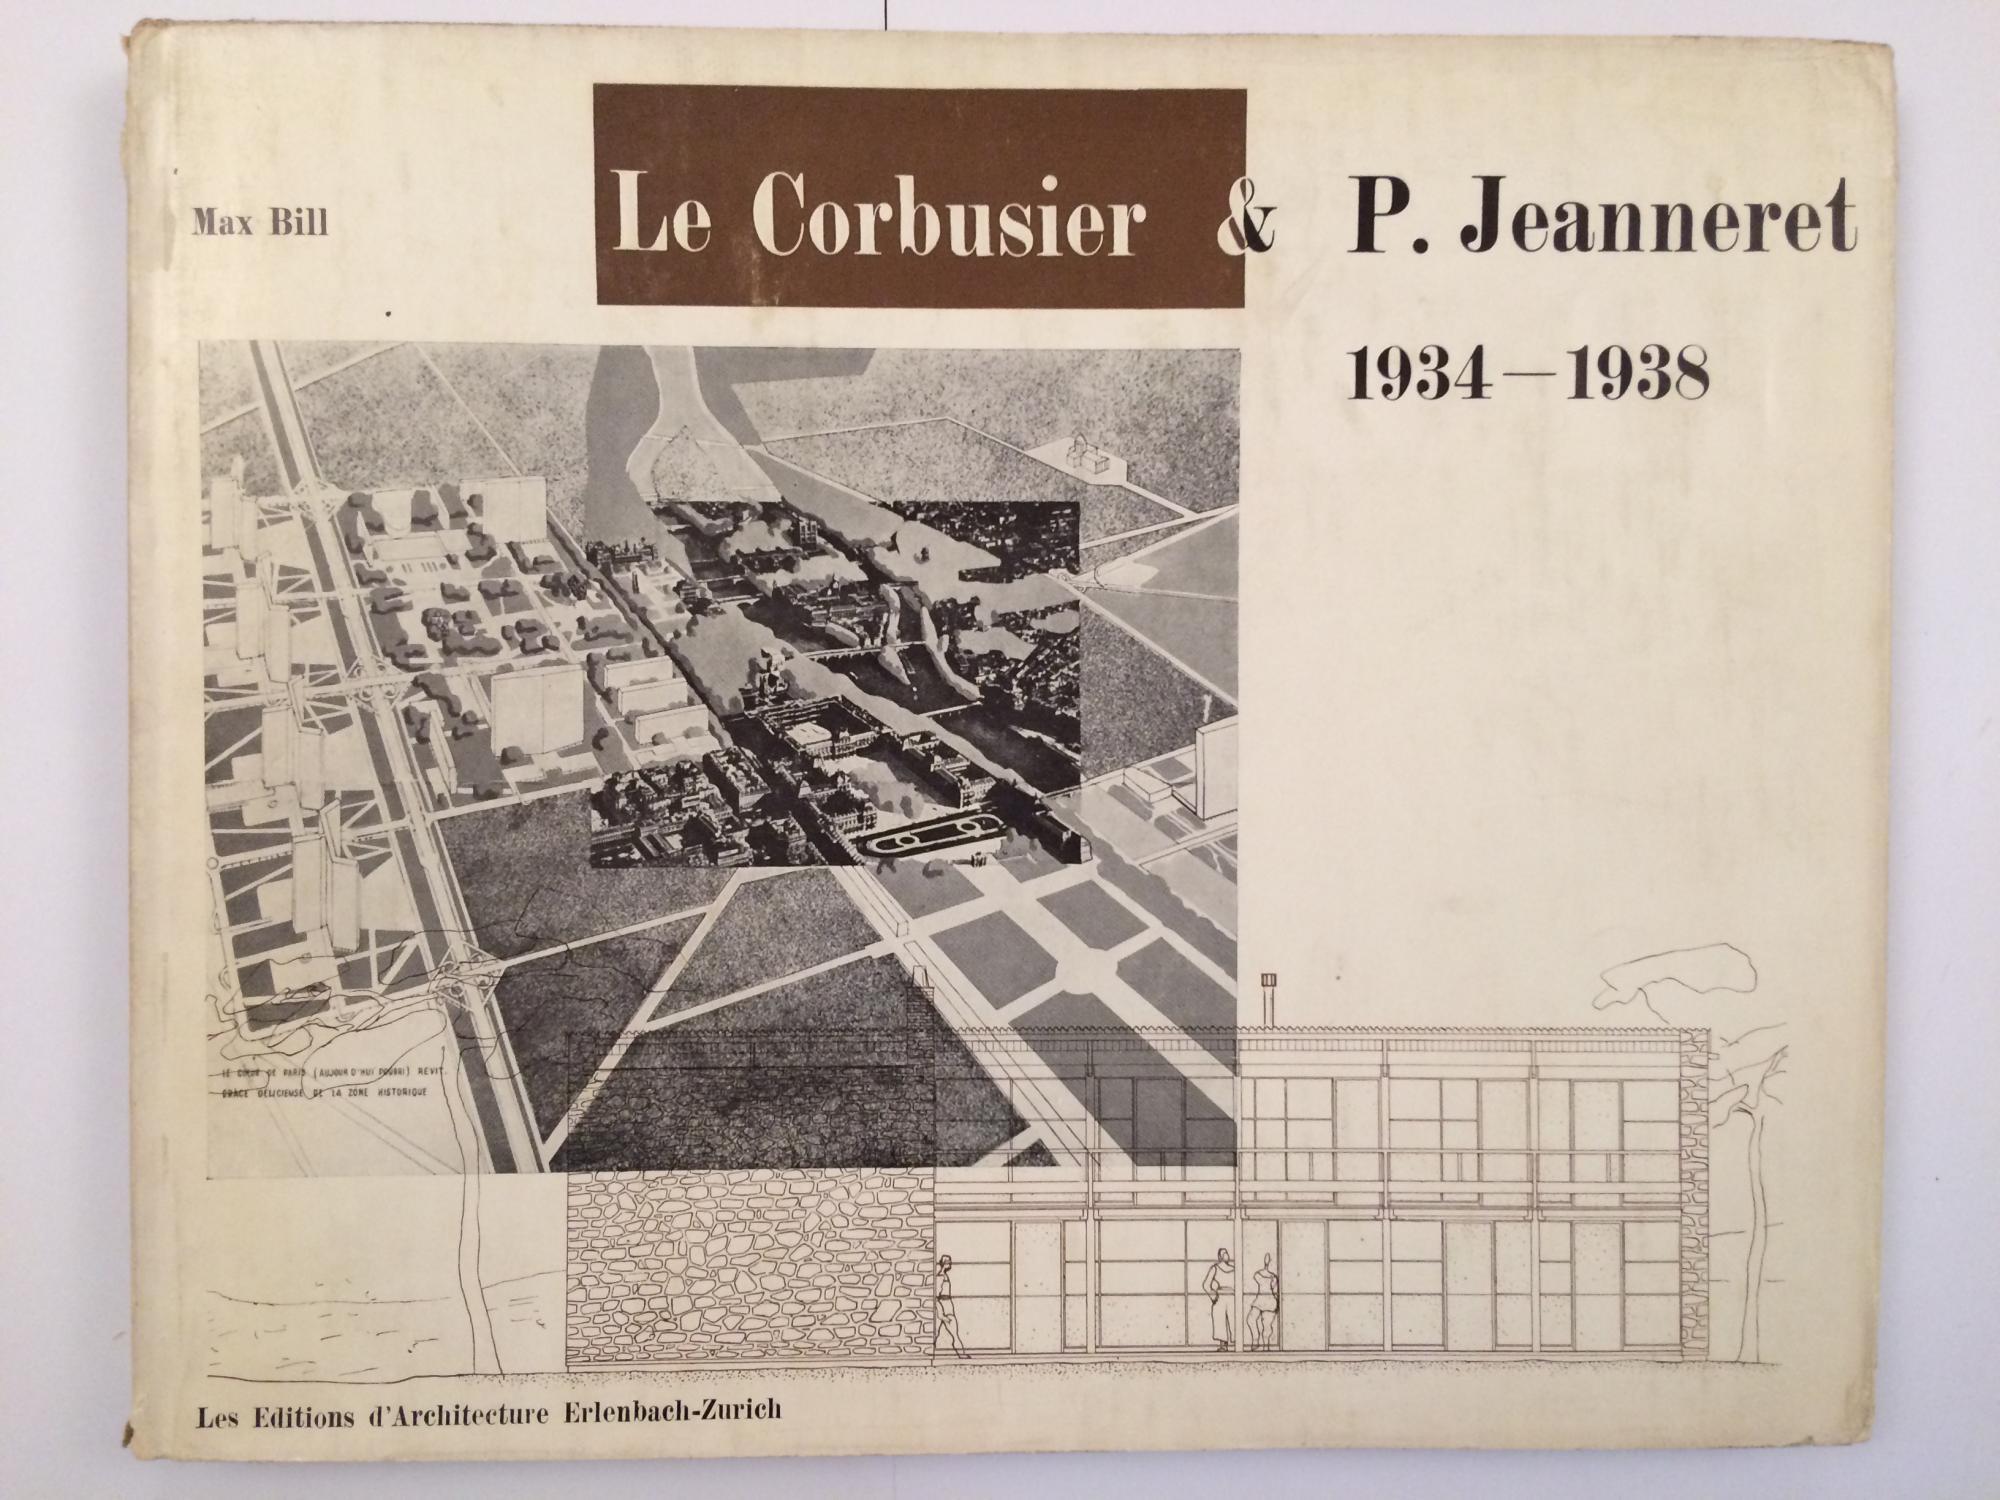 le corbusier p jeanneret oeuvre compl te 1934 1938 by le. Black Bedroom Furniture Sets. Home Design Ideas